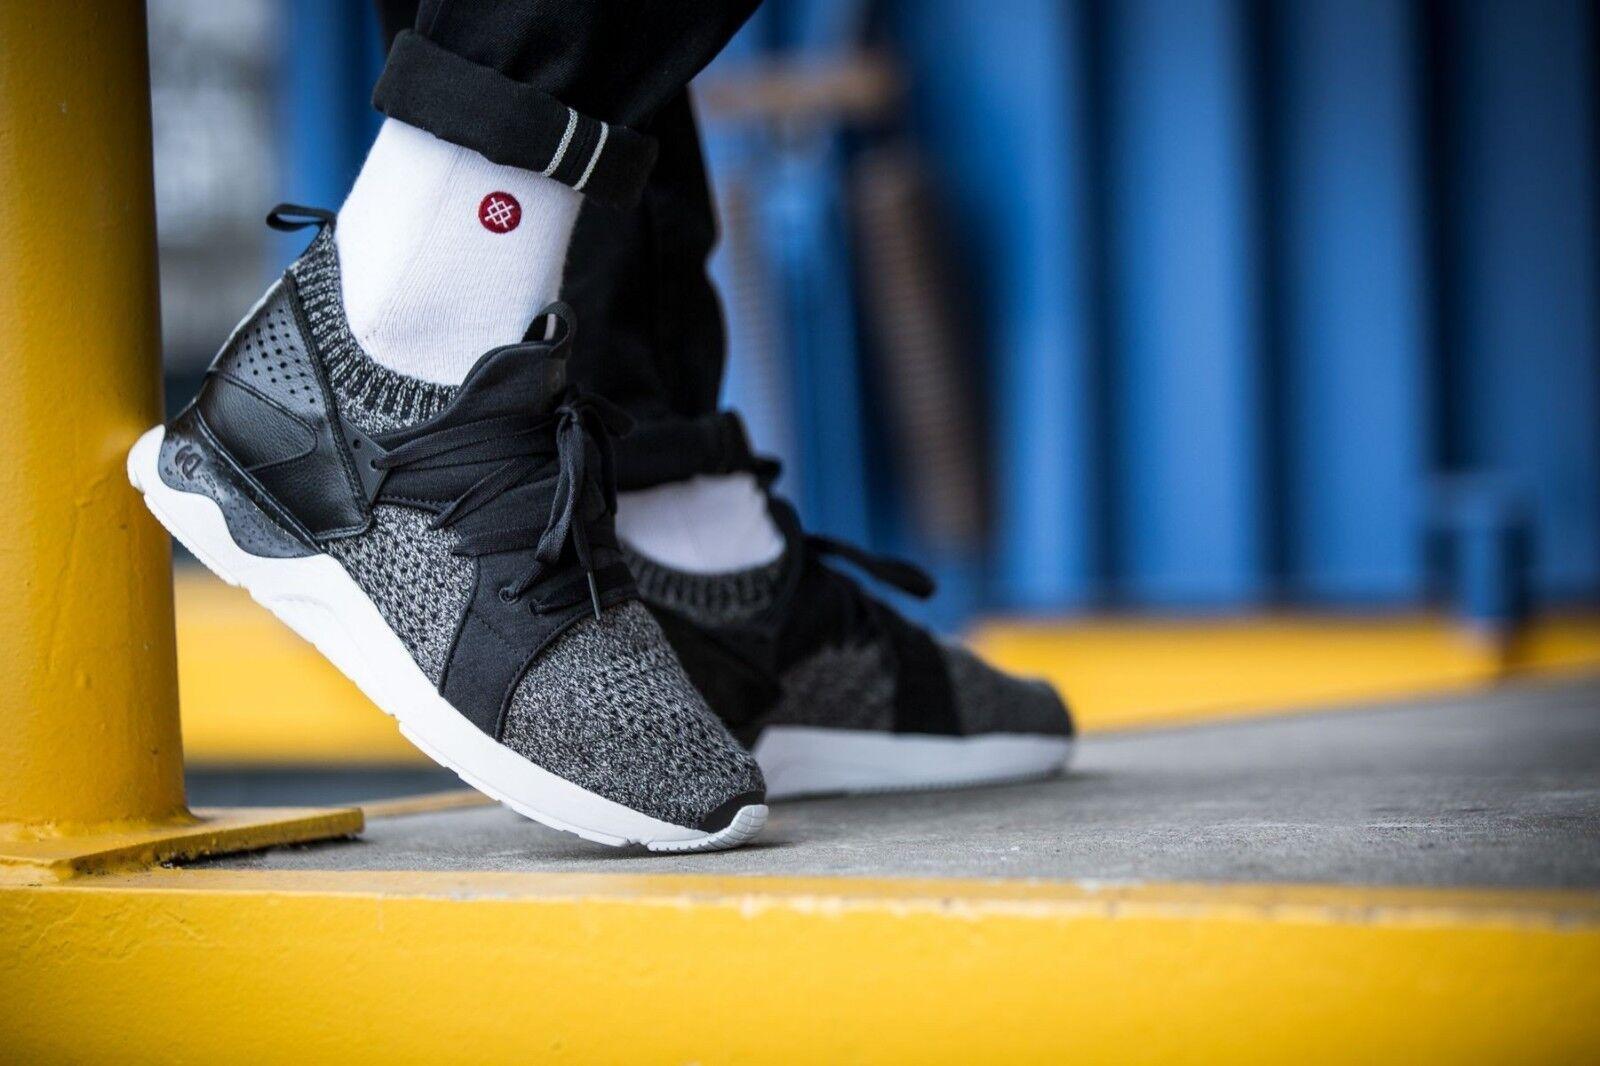 Asics Tiger Gel-Lyte V Sanze Knit  Mid Grey H8K1N-9696  Men's Athletic Sneakers